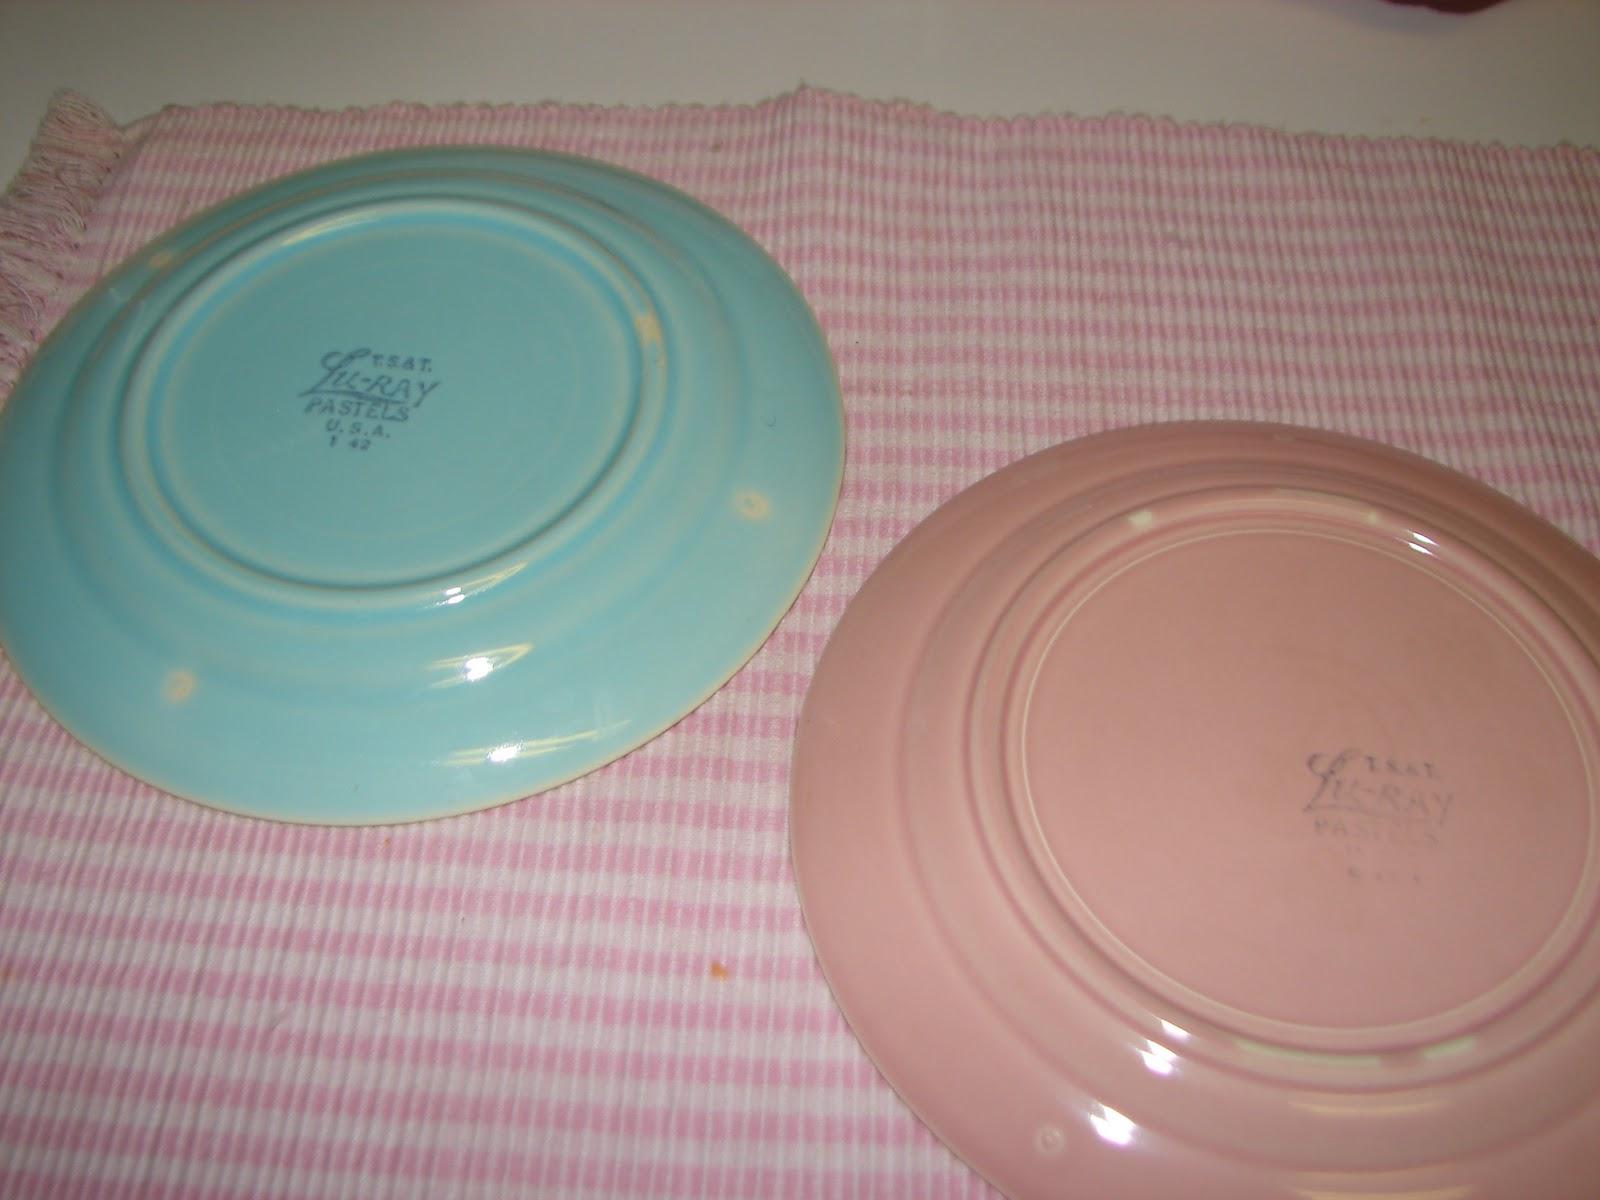 http://4.bp.blogspot.com/-V7-8076jz1c/Tr88vALwPHI/AAAAAAAAAf4/mxBSJUvv4Rs/s1600/luRay.plates.1b.JPG